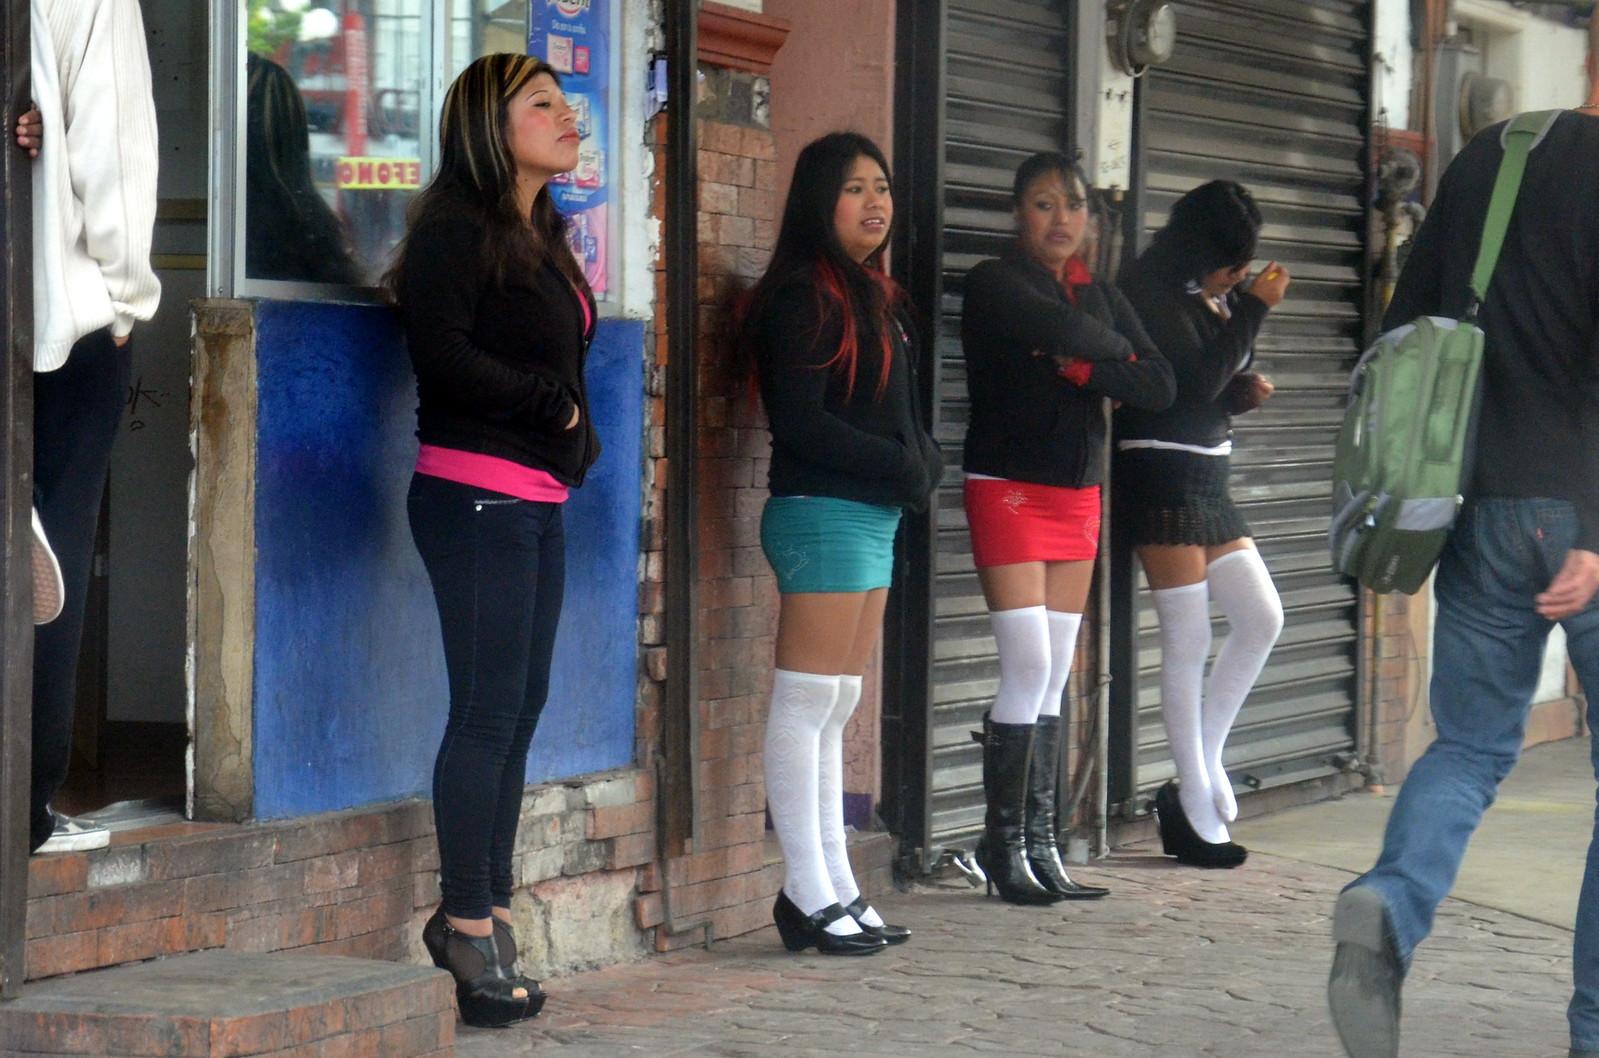 Mujeres solteras zona norte mulher se oferece São José-72150